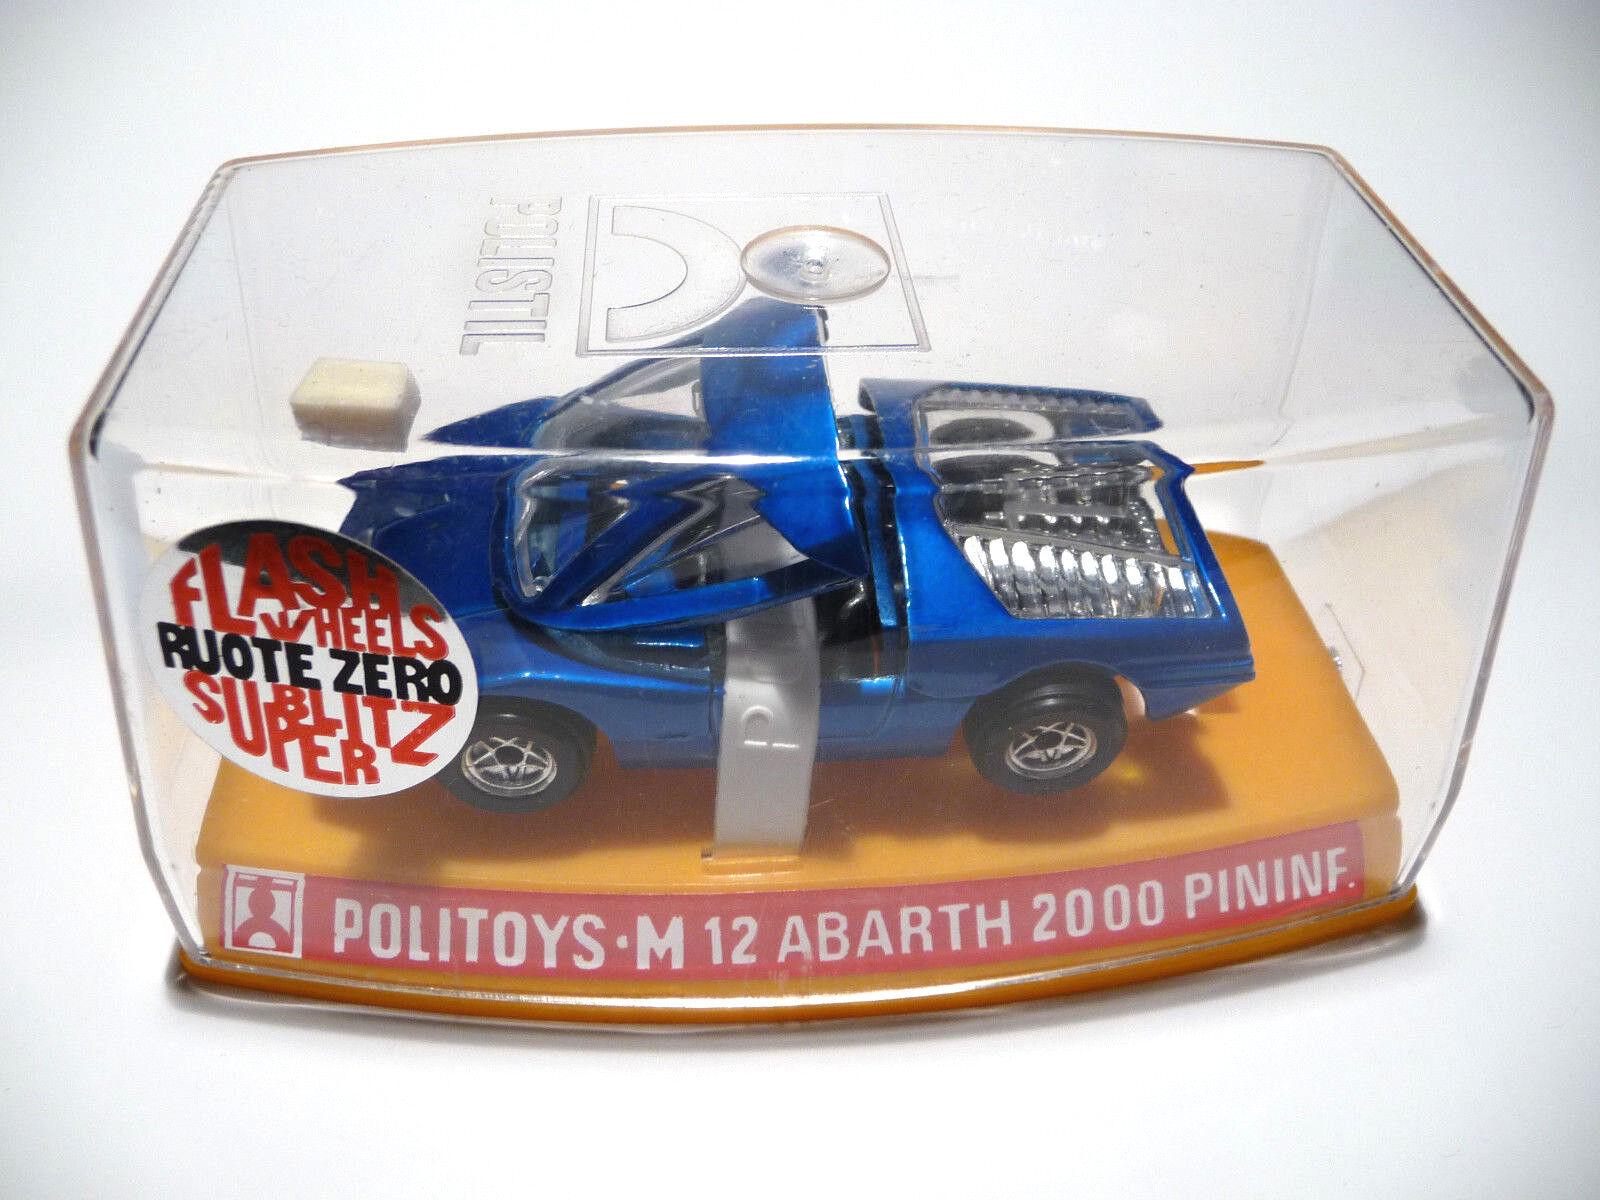 POLITOYS M 12 ABARTH 2000 PININFARINA - 1 43 in Box  | Hervorragende Eigenschaften